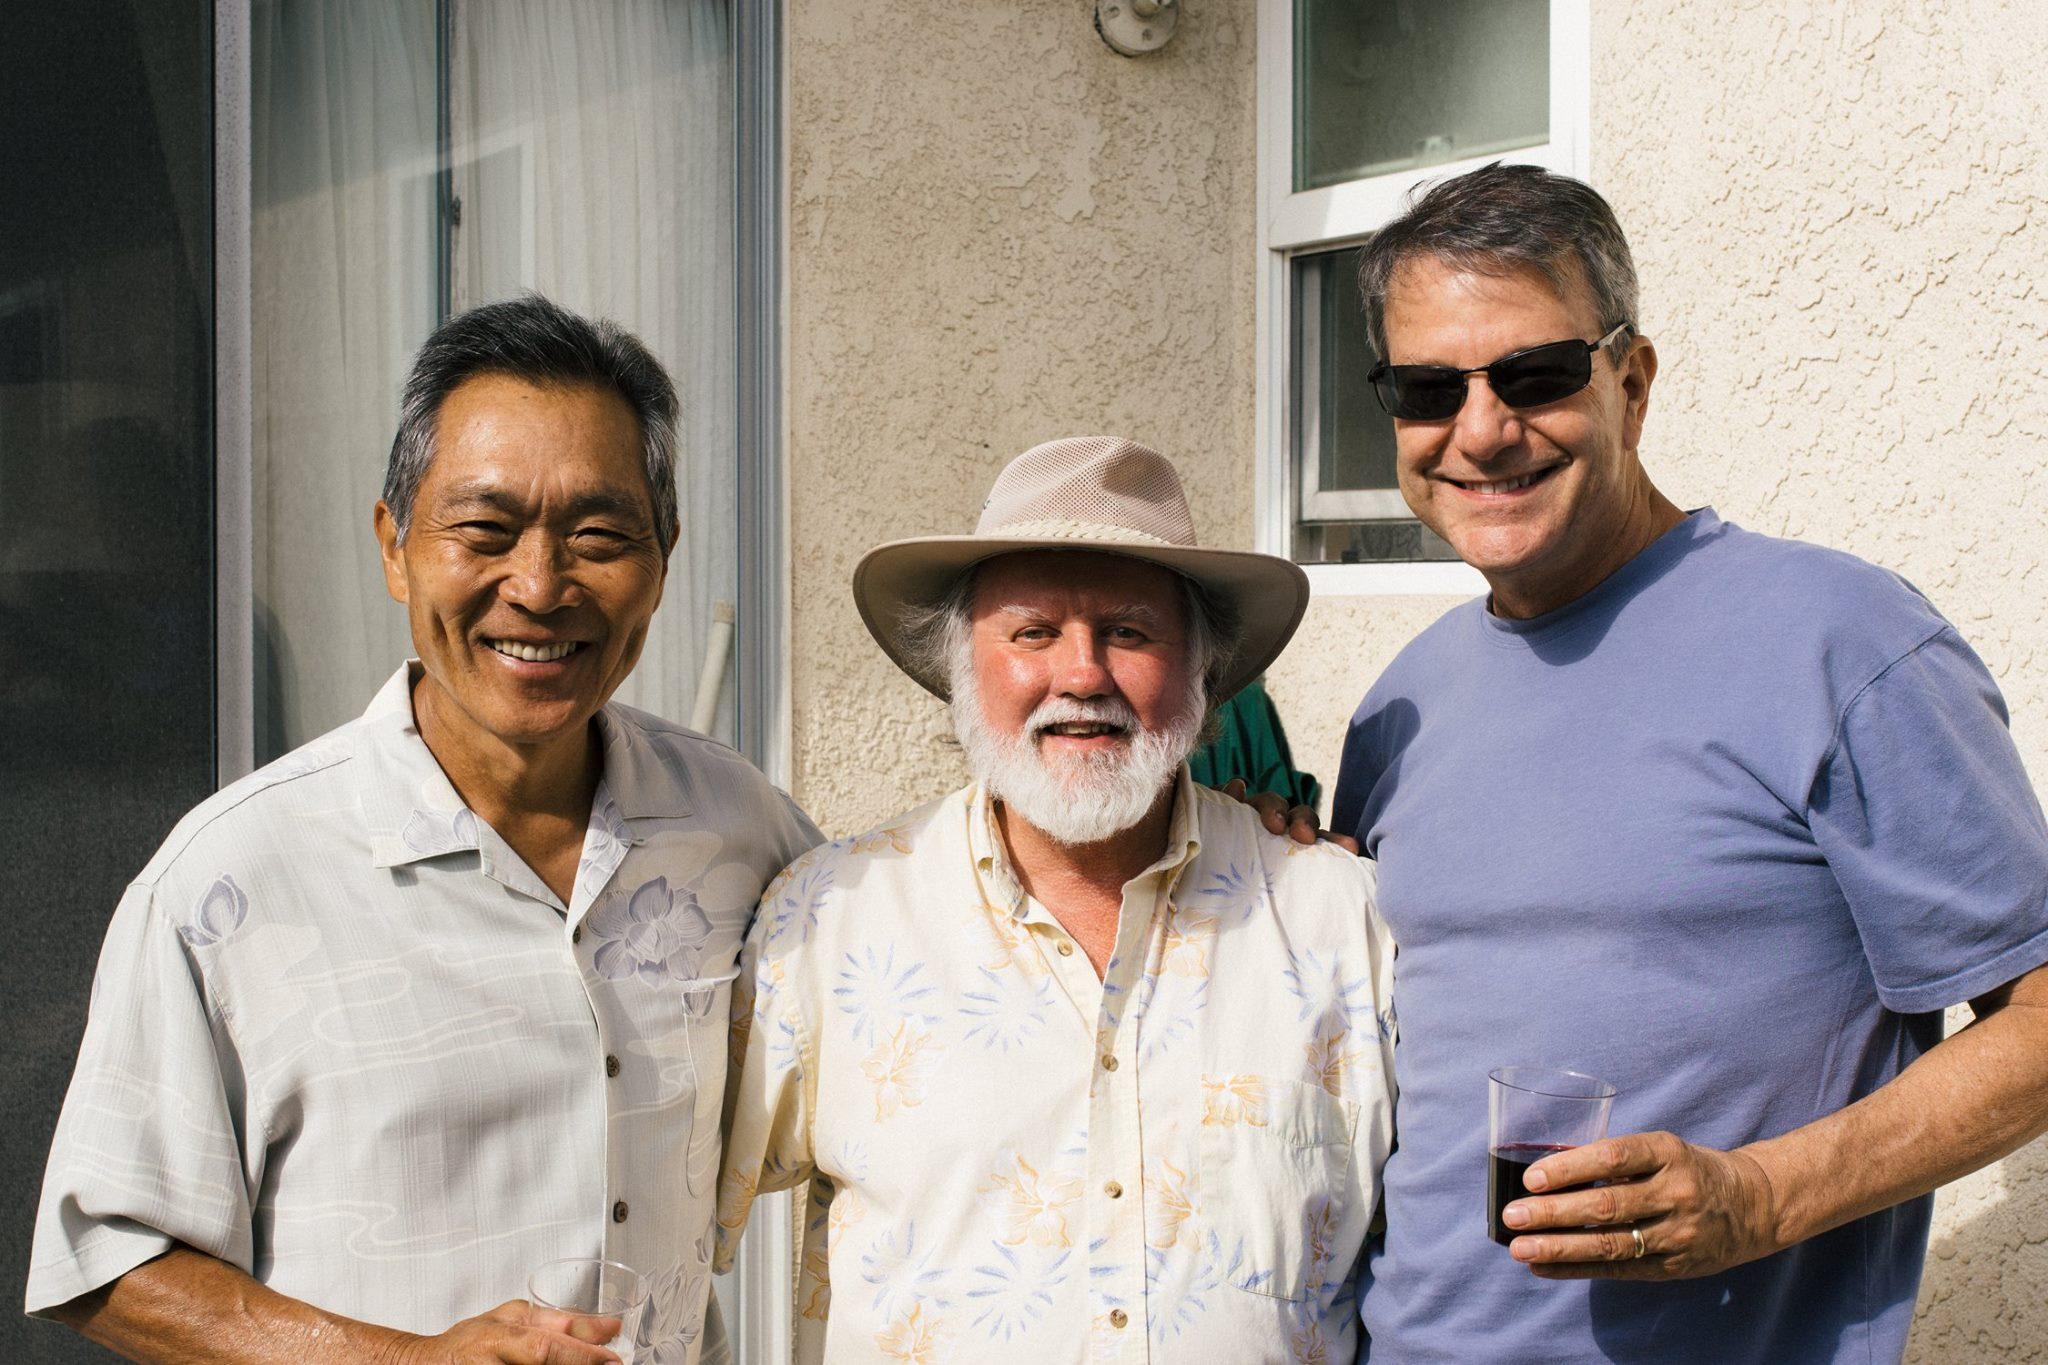 MEL MASUSDA, JACK, & KYLE NORTHWAY                 G(entle)-Men Indeed  Bringing humility, wisdom & courage to many Kingdom enterprises- An honor to know them